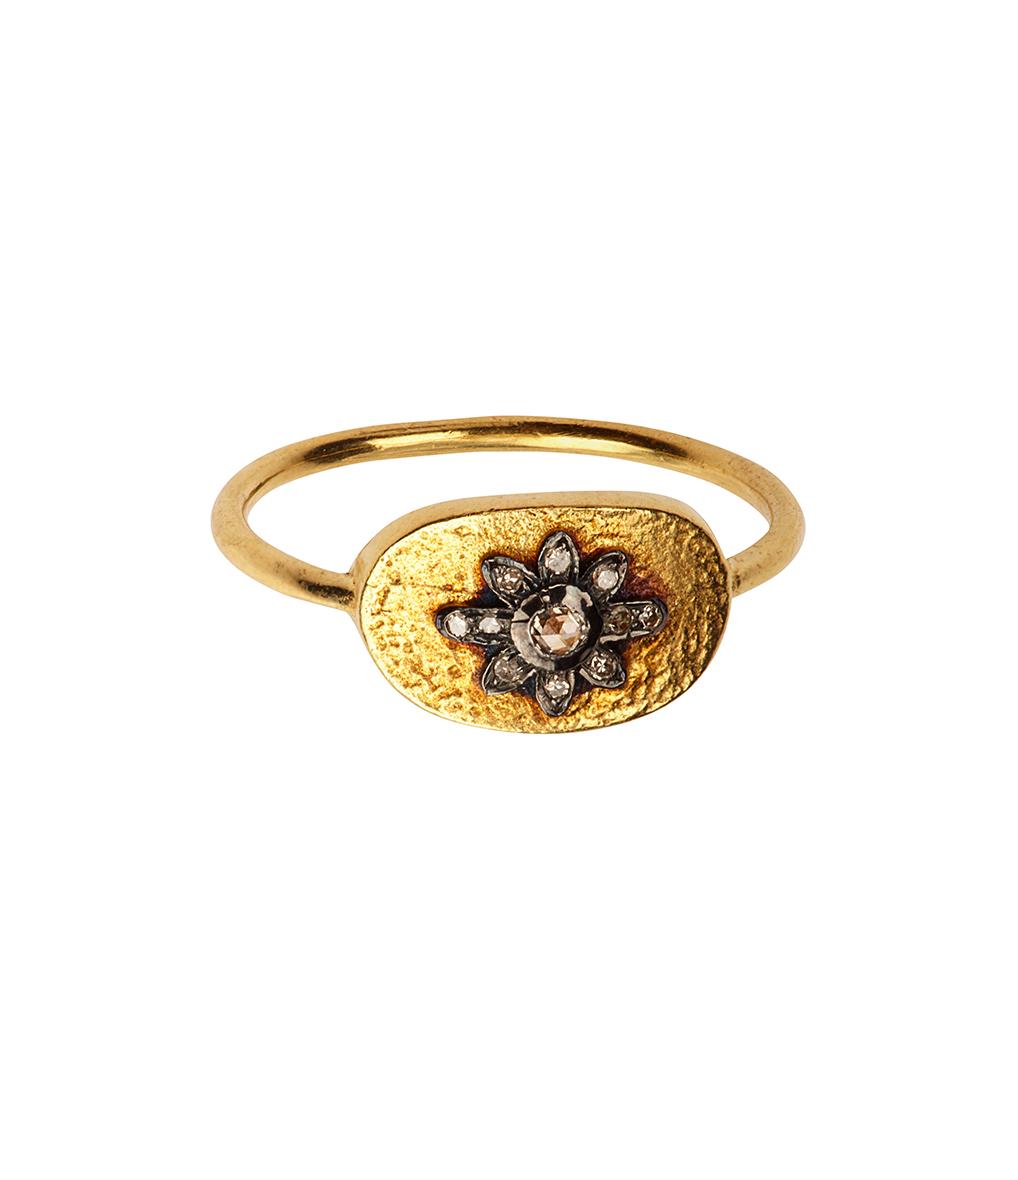 Bague Gypsy Fetiches Nael Diamants Argent